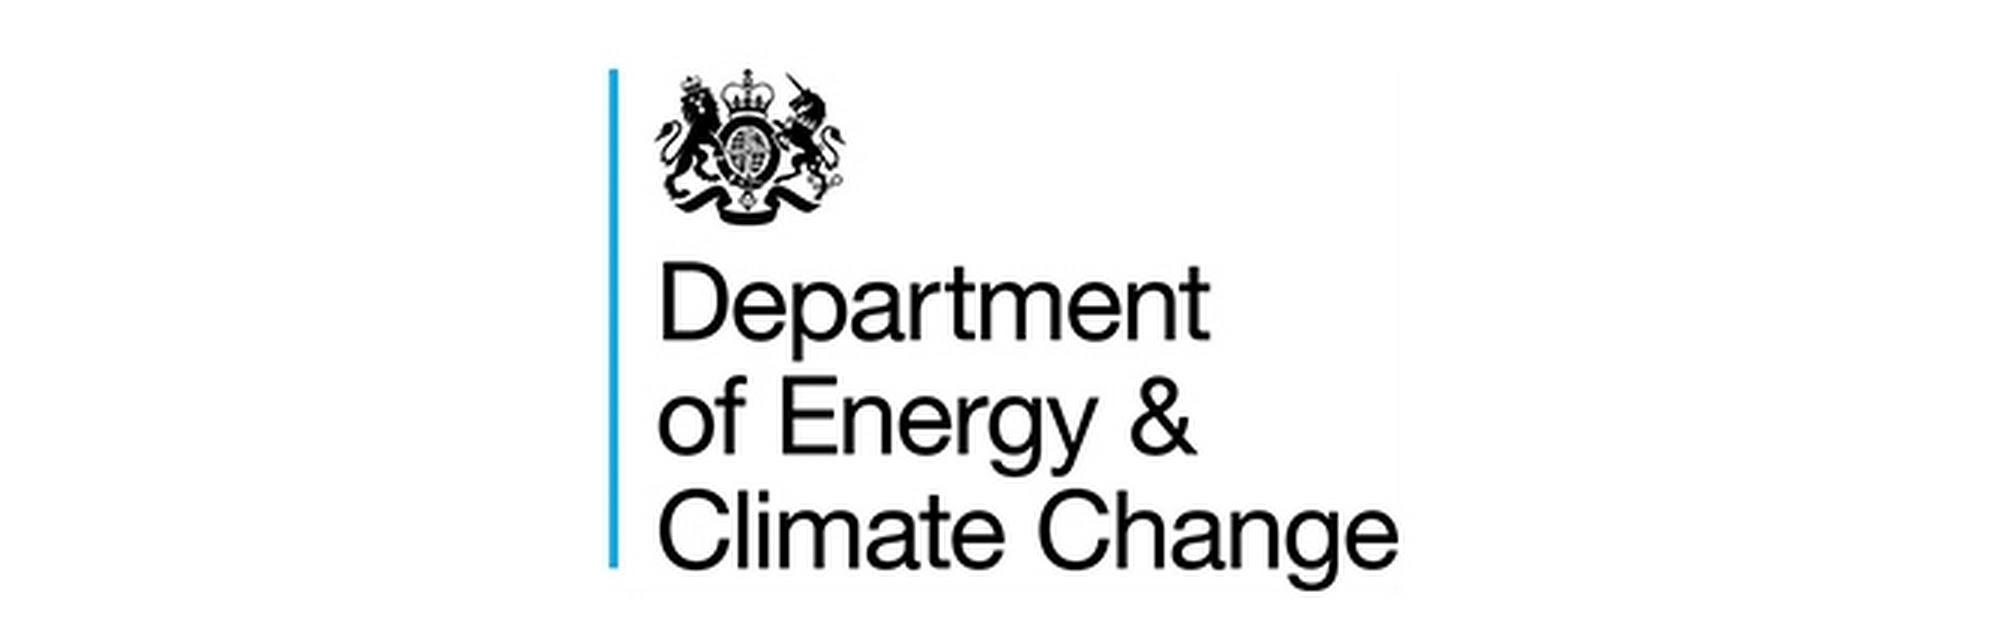 DECC organisational logo